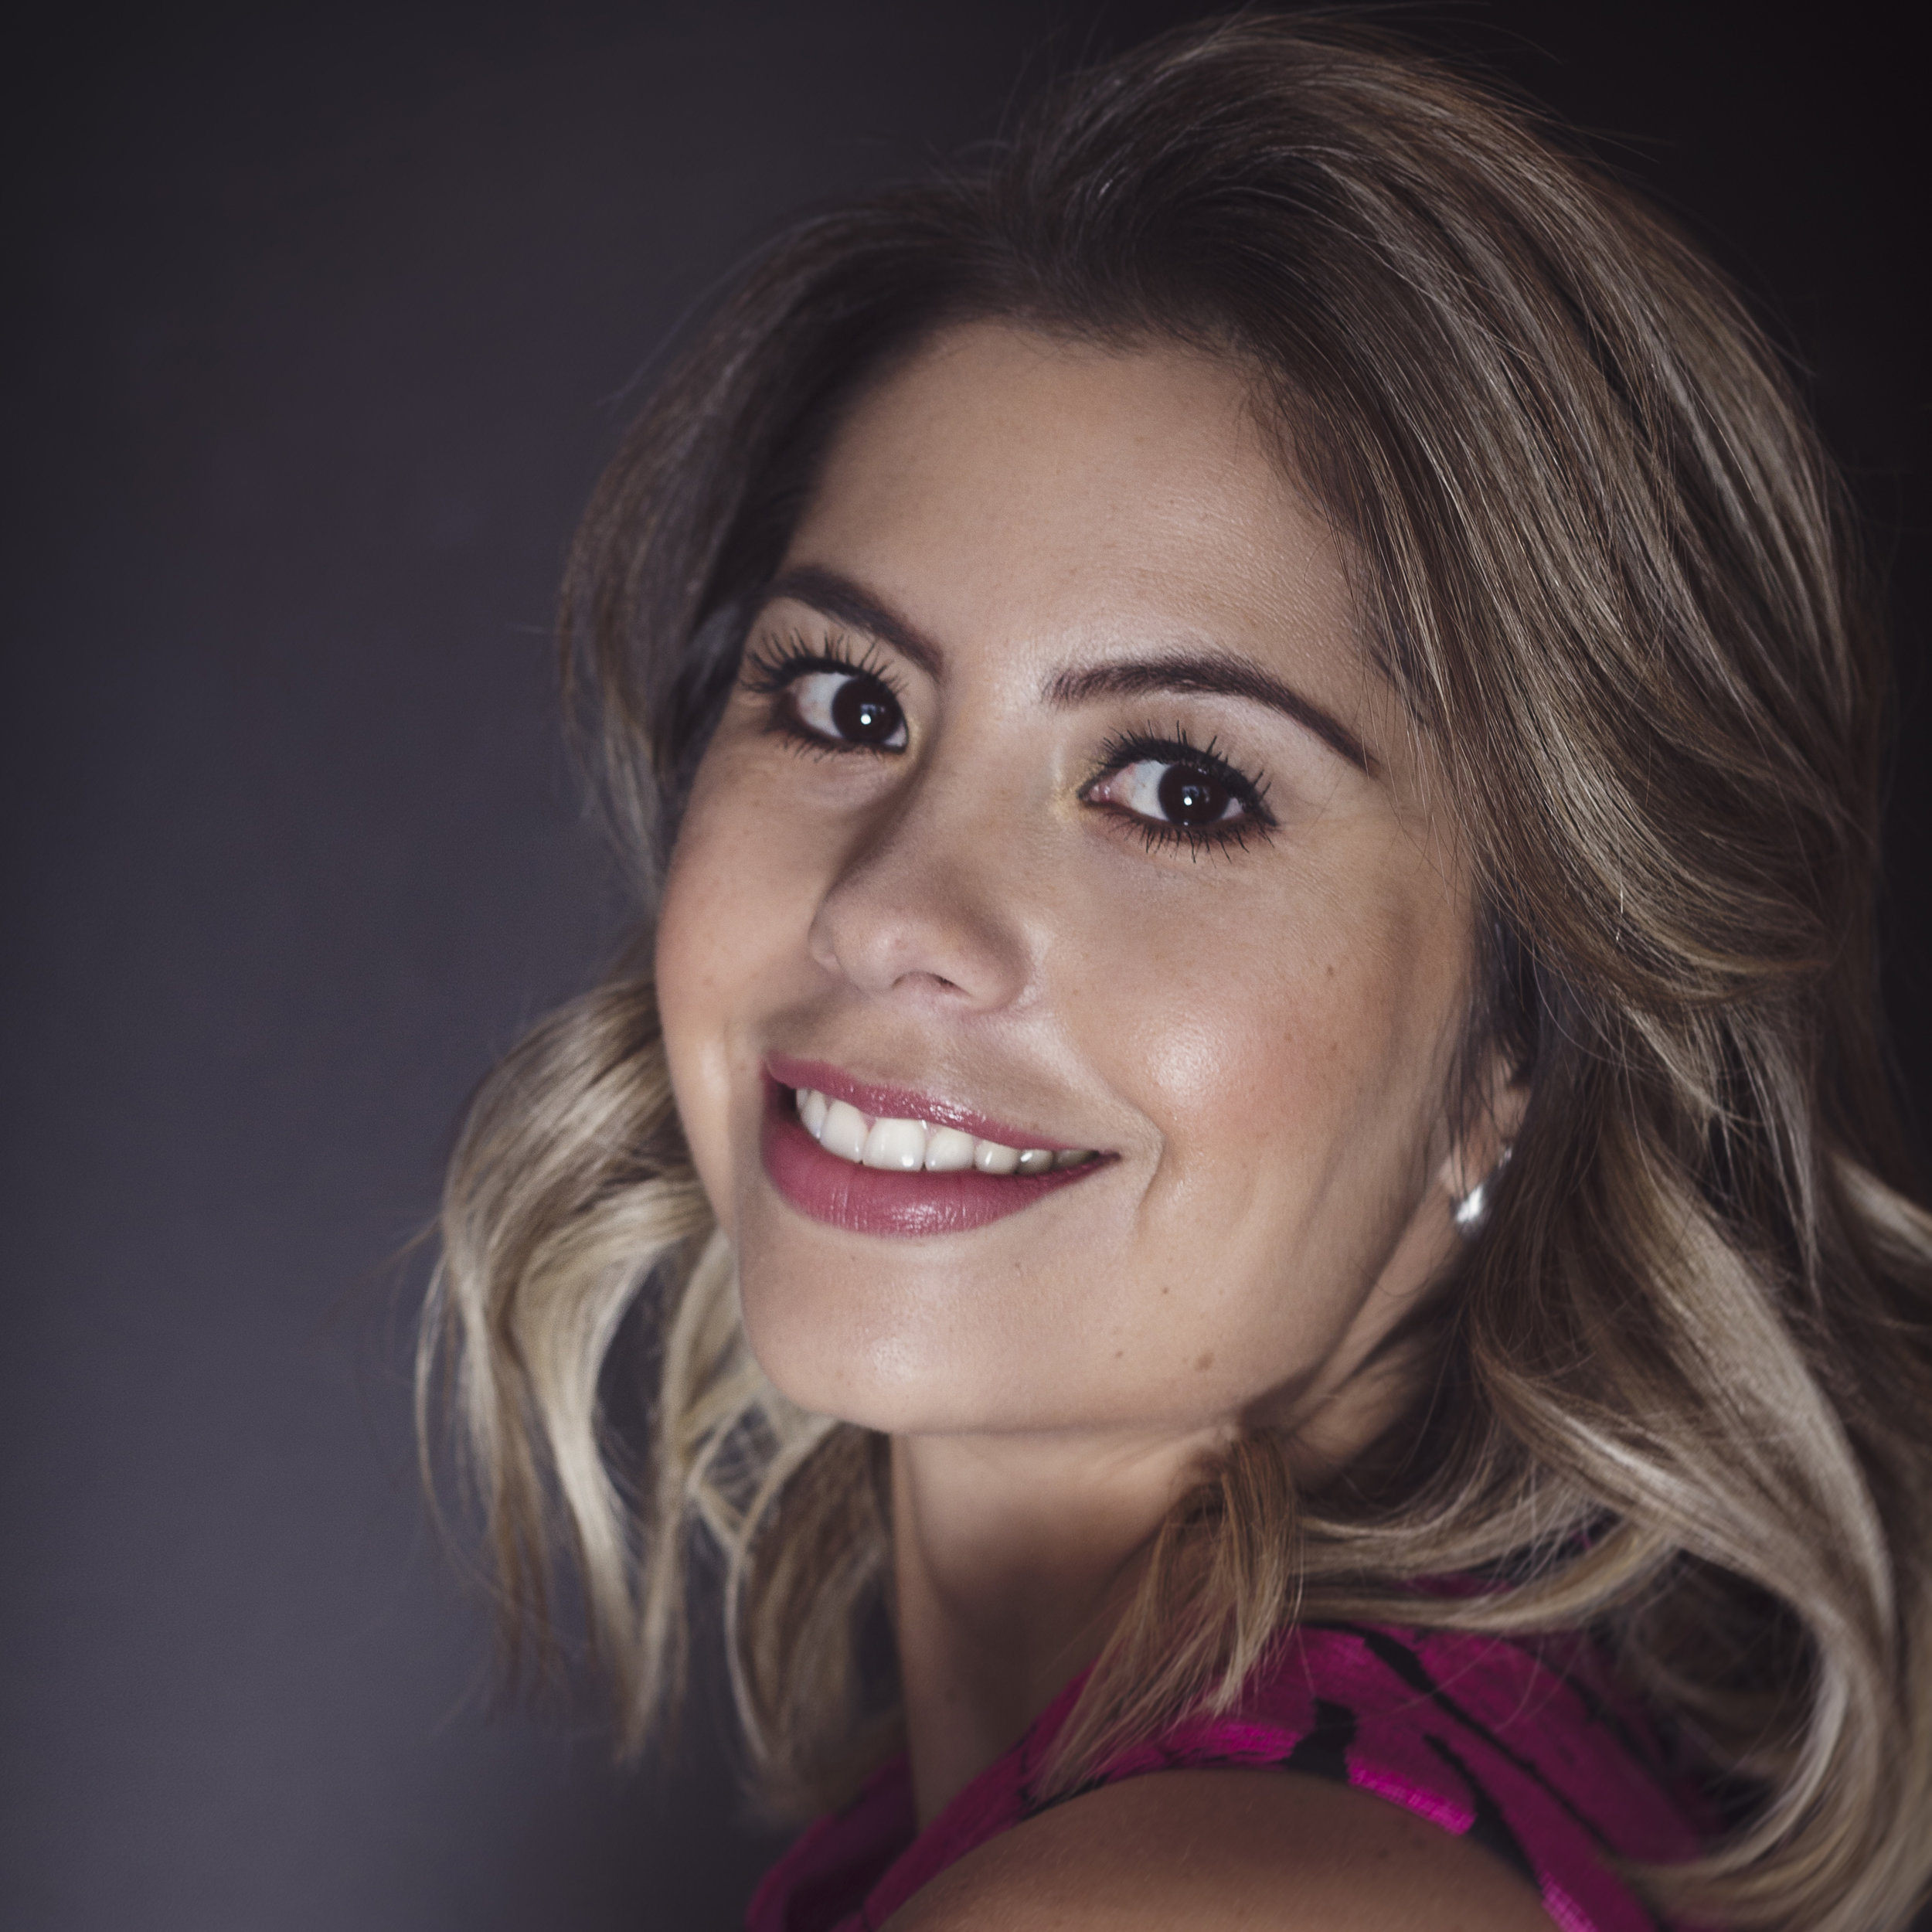 PAULA ABREU   Experta en bodas, creadora del concepto coaching con chispa y corazón, posicionó a Puebla como ciudad de bodas destino.